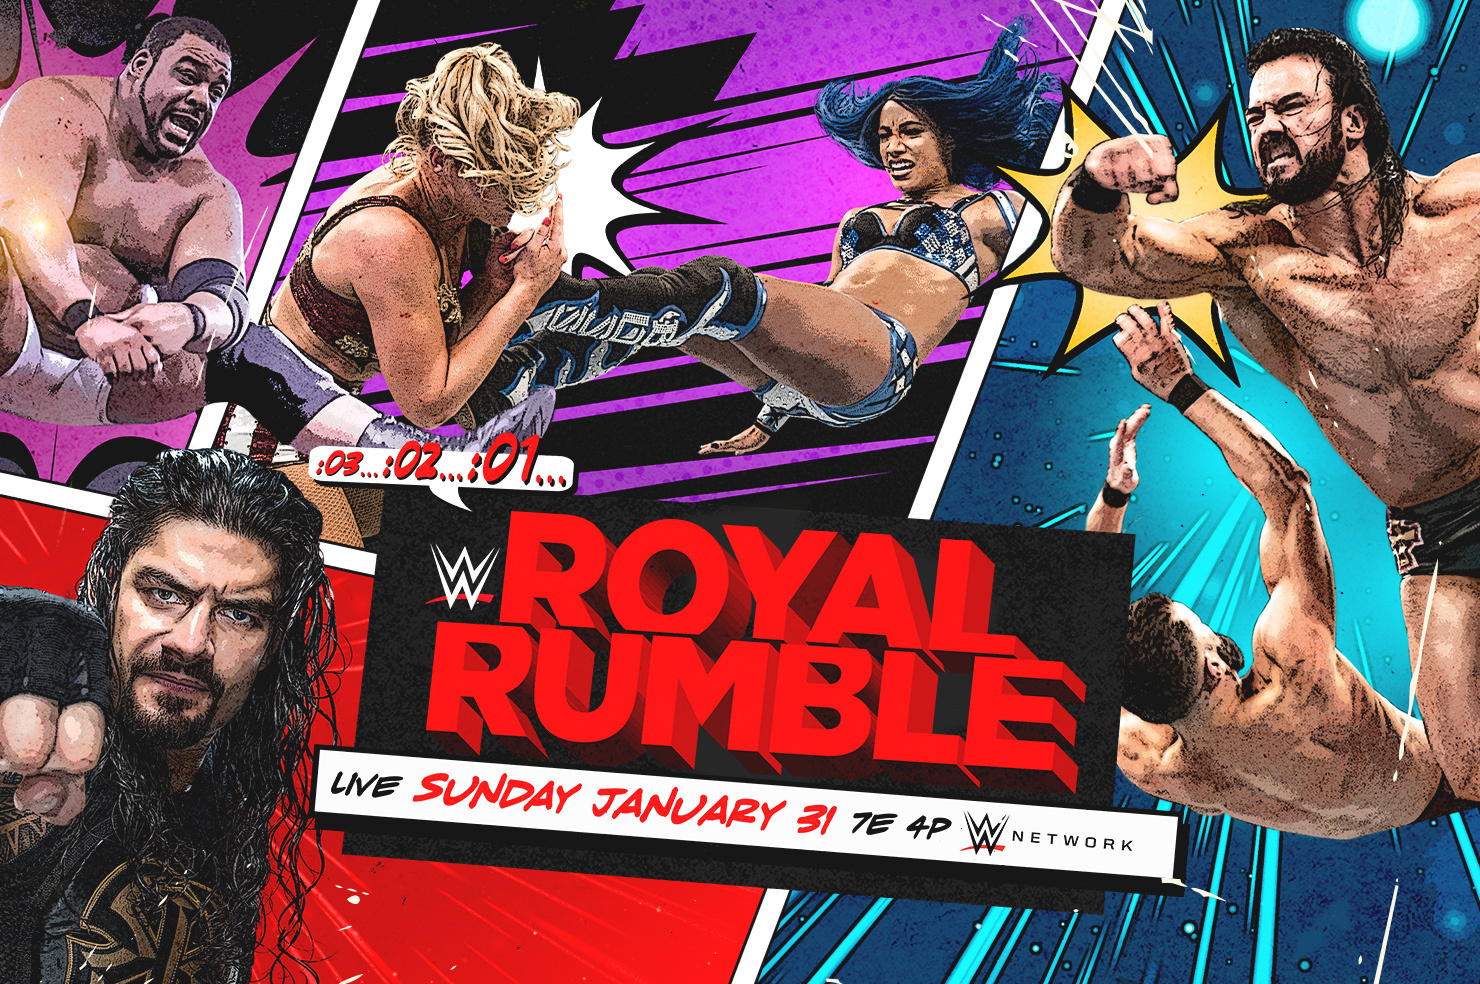 Wwe royal rumble live